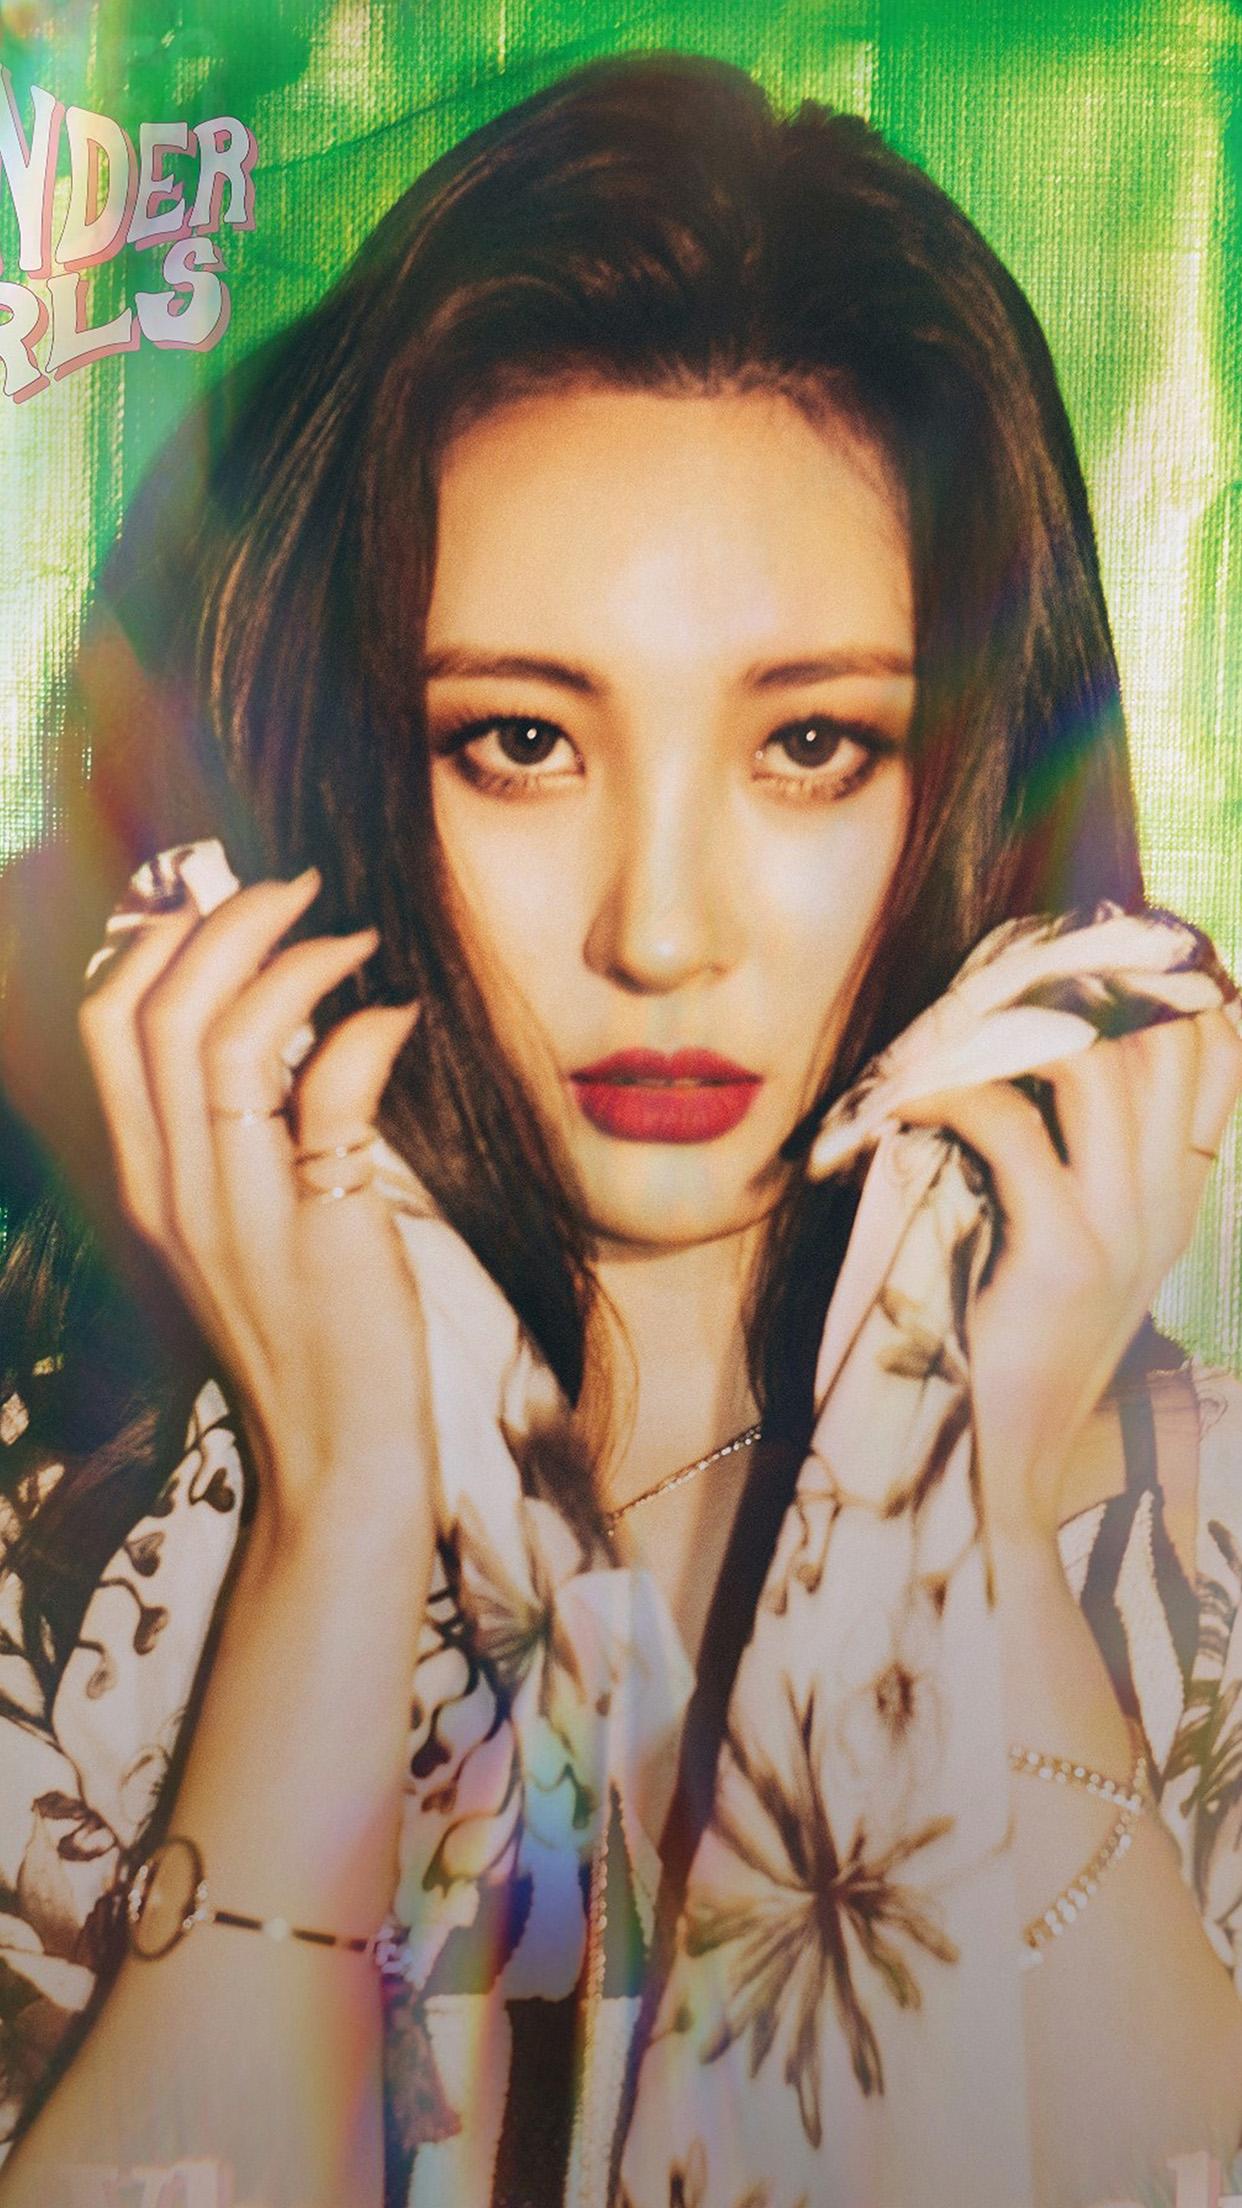 Iphone6papersco Iphone 6 Wallpaper Hj74 Wonder Girls